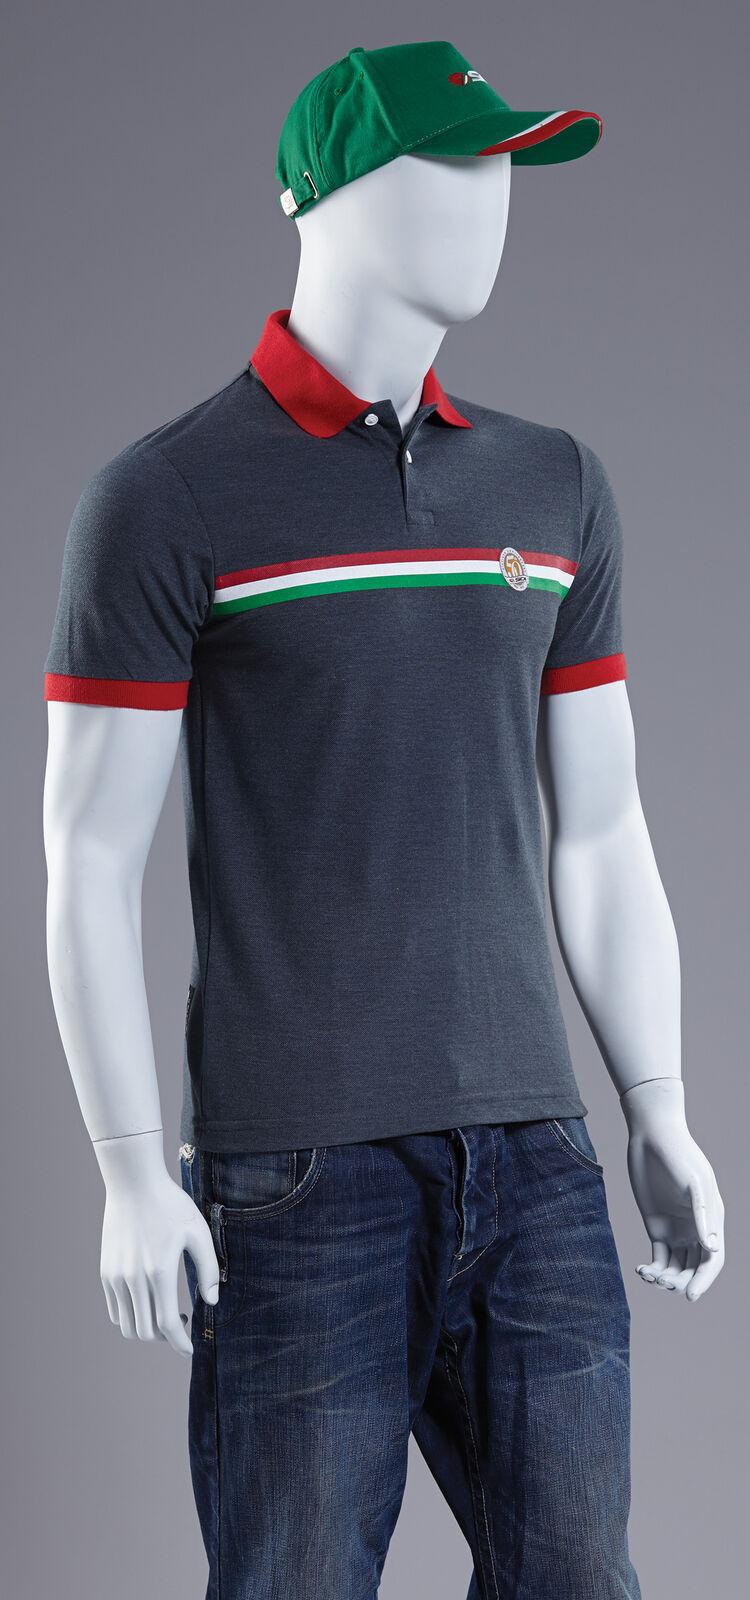 Sidi Freizeit 2015 Motorrad Fahrrad Heritage Polohemd T-Shirt T-Shirt T-Shirt 54a32f